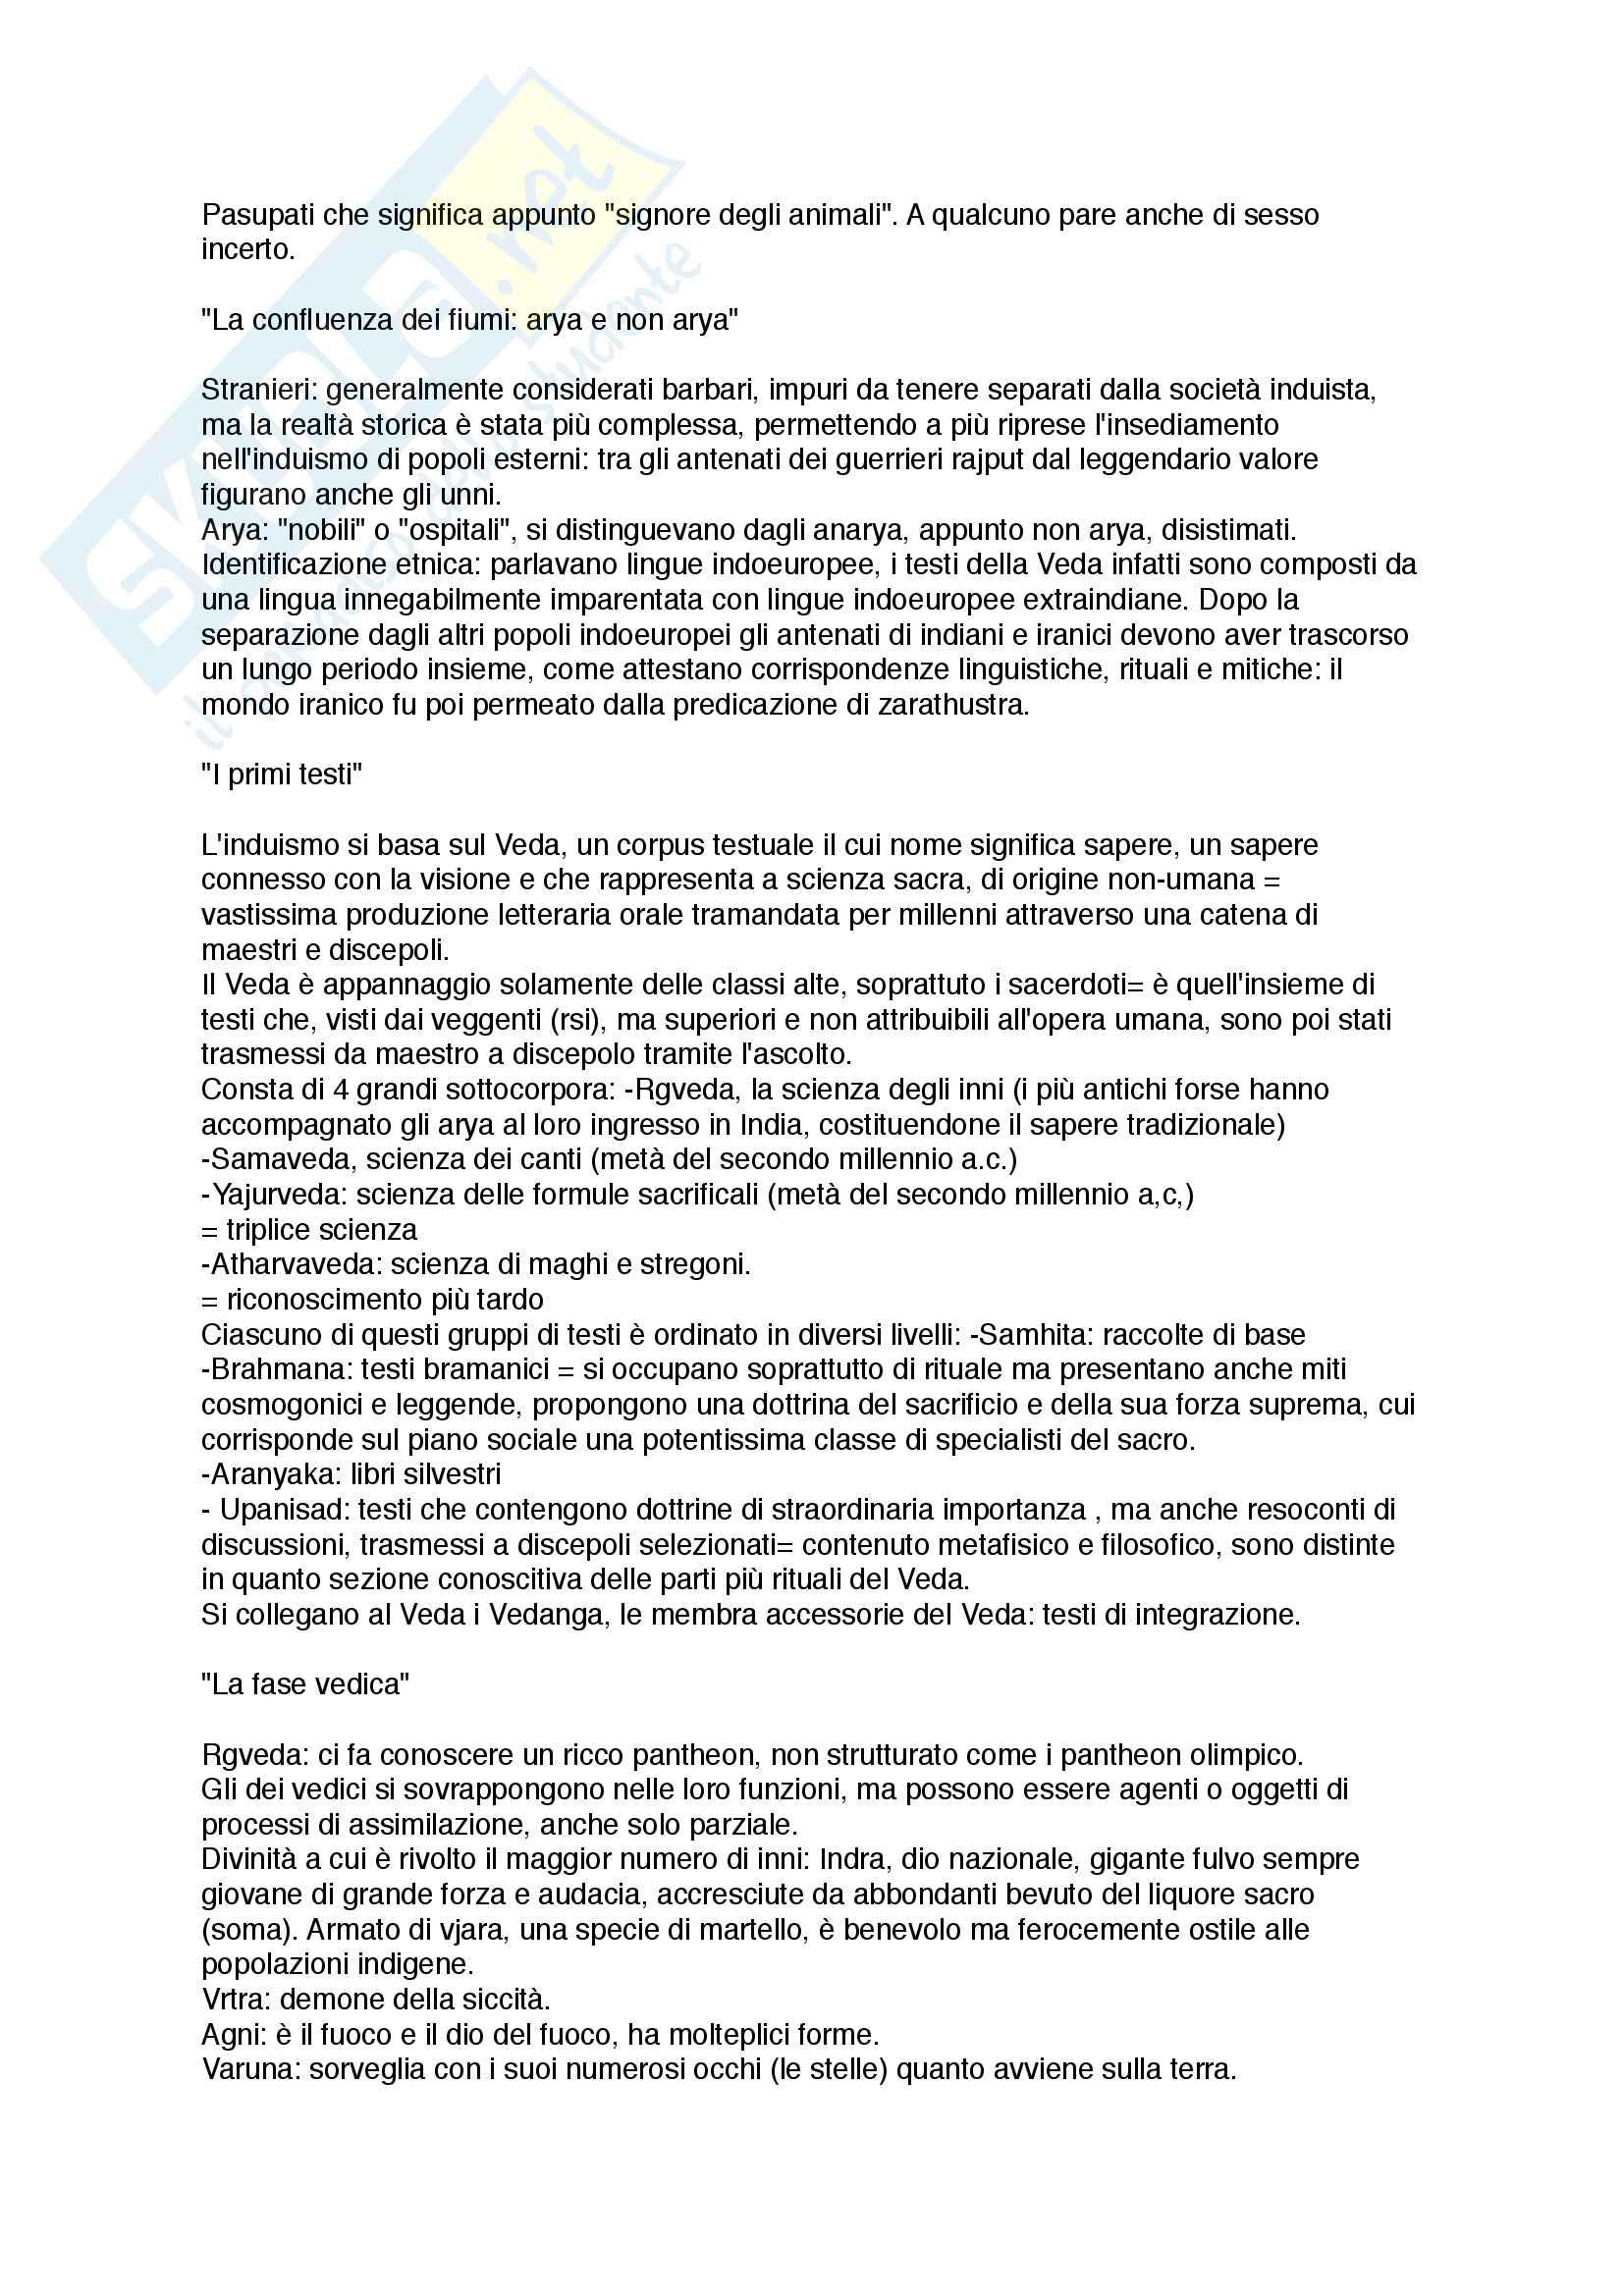 Induismo - Indologia Pag. 2